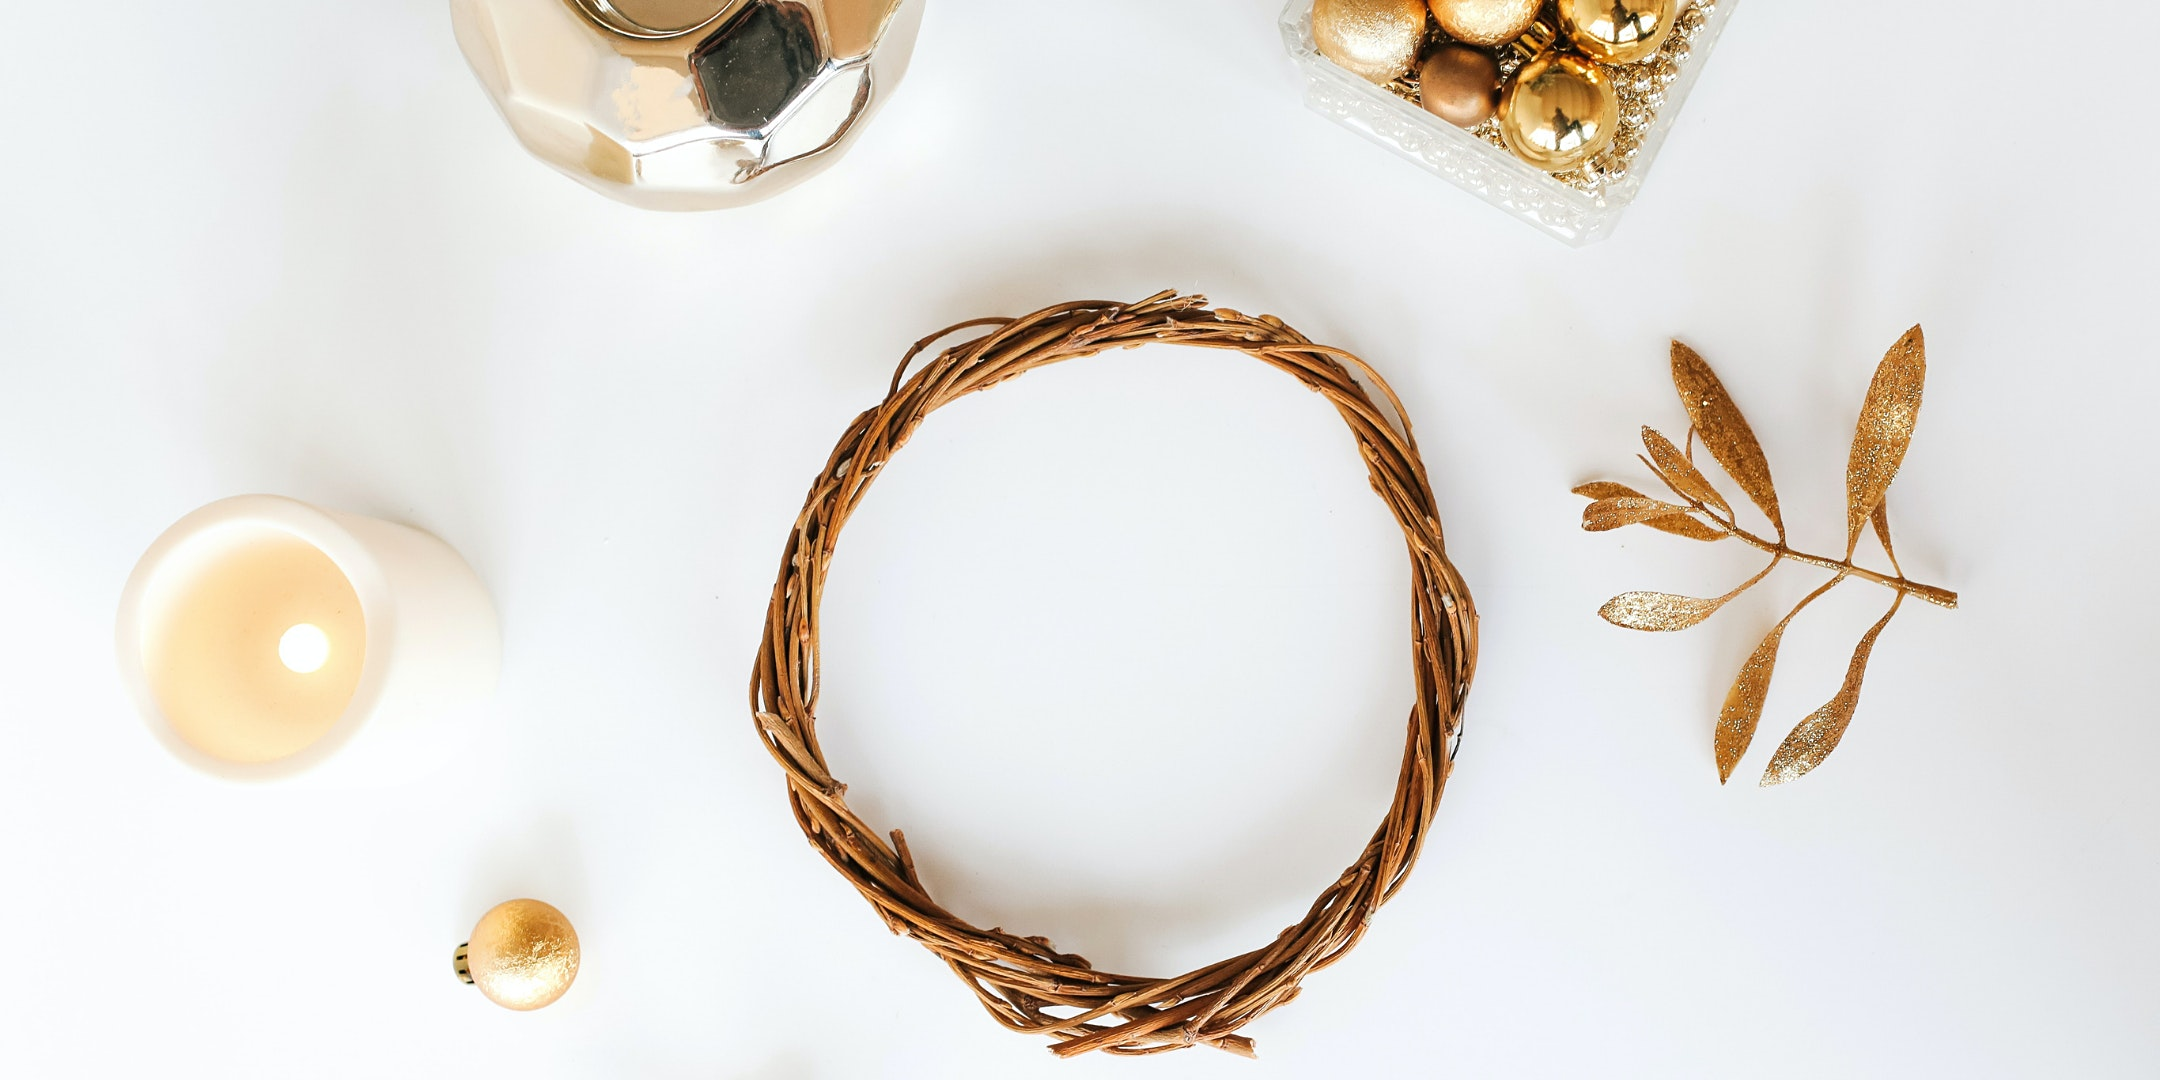 DIY Workshop: HudCo Wreath and Merry-making